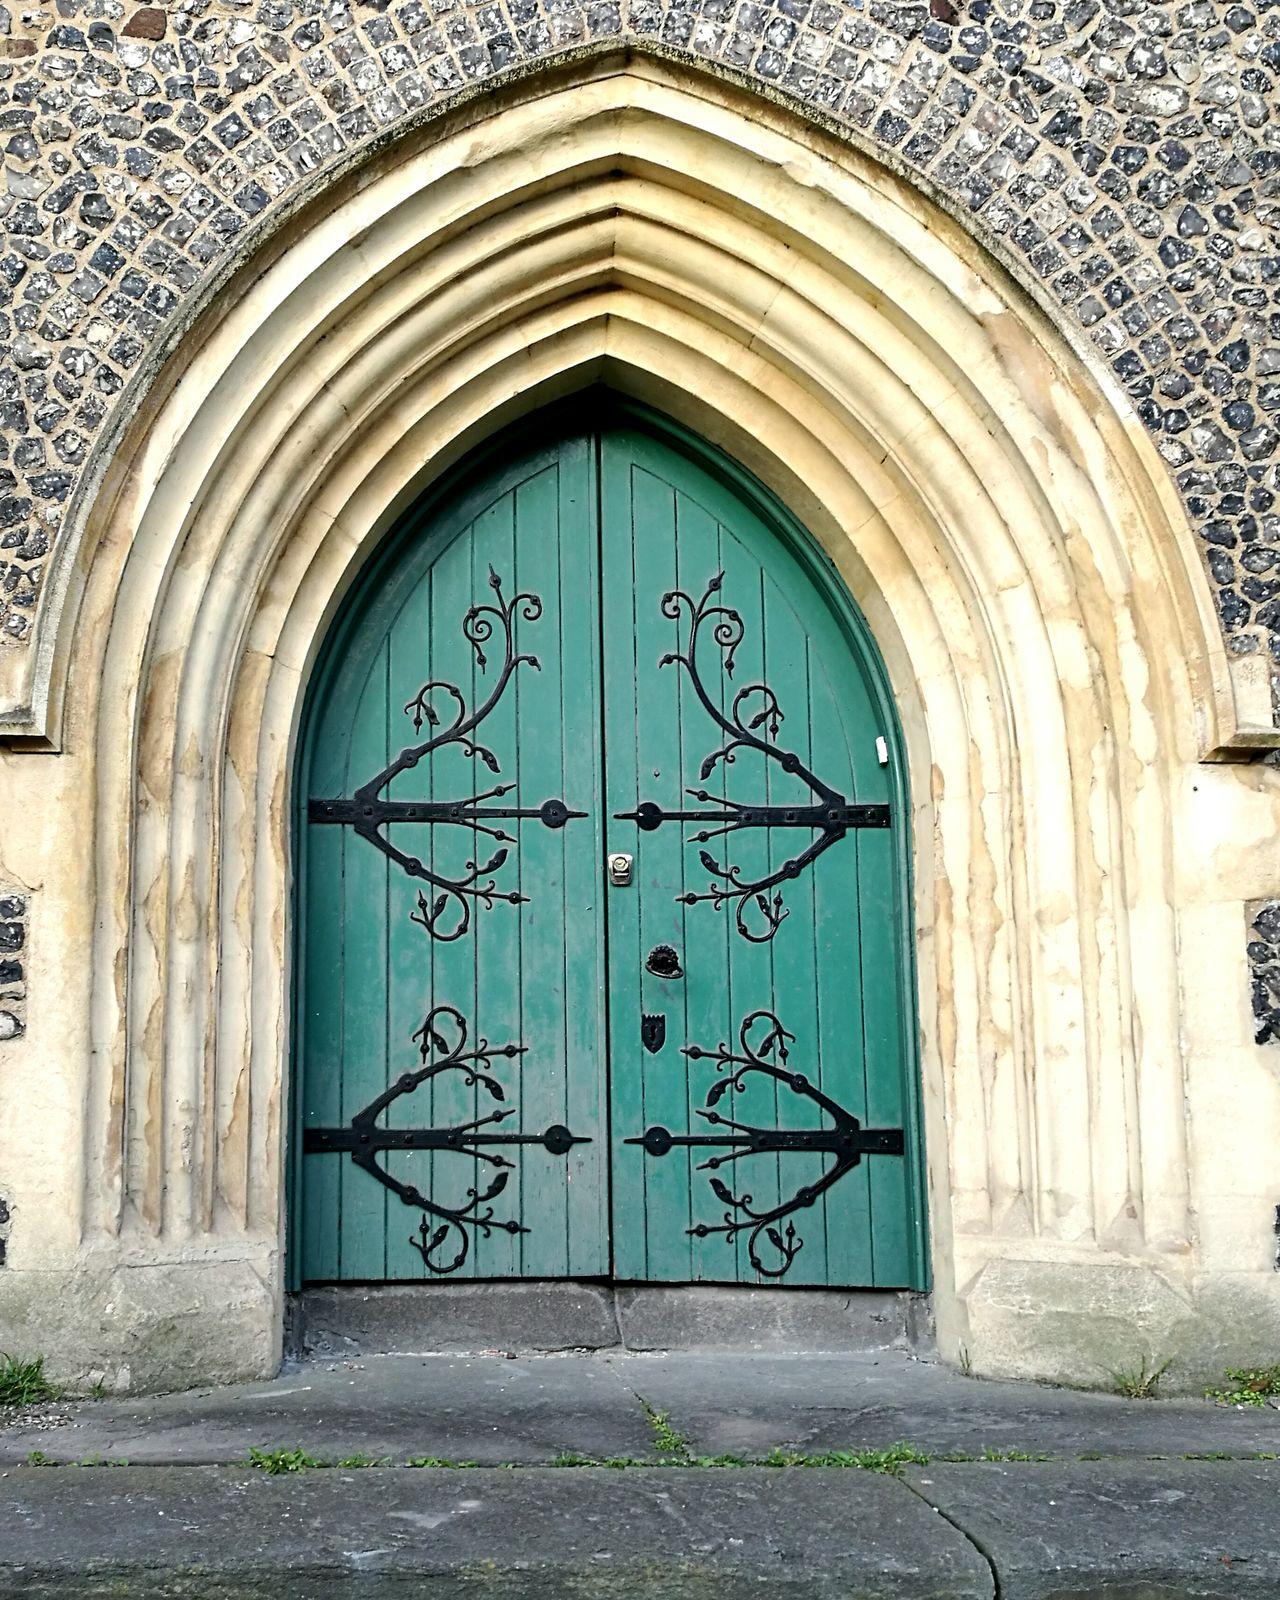 EyeEmNewHere History Old Vintage Built Structure Cultures Green No People Outdoors Swirl Doors Backgrounds Blacksmith  Metal Medieval Elven Elf